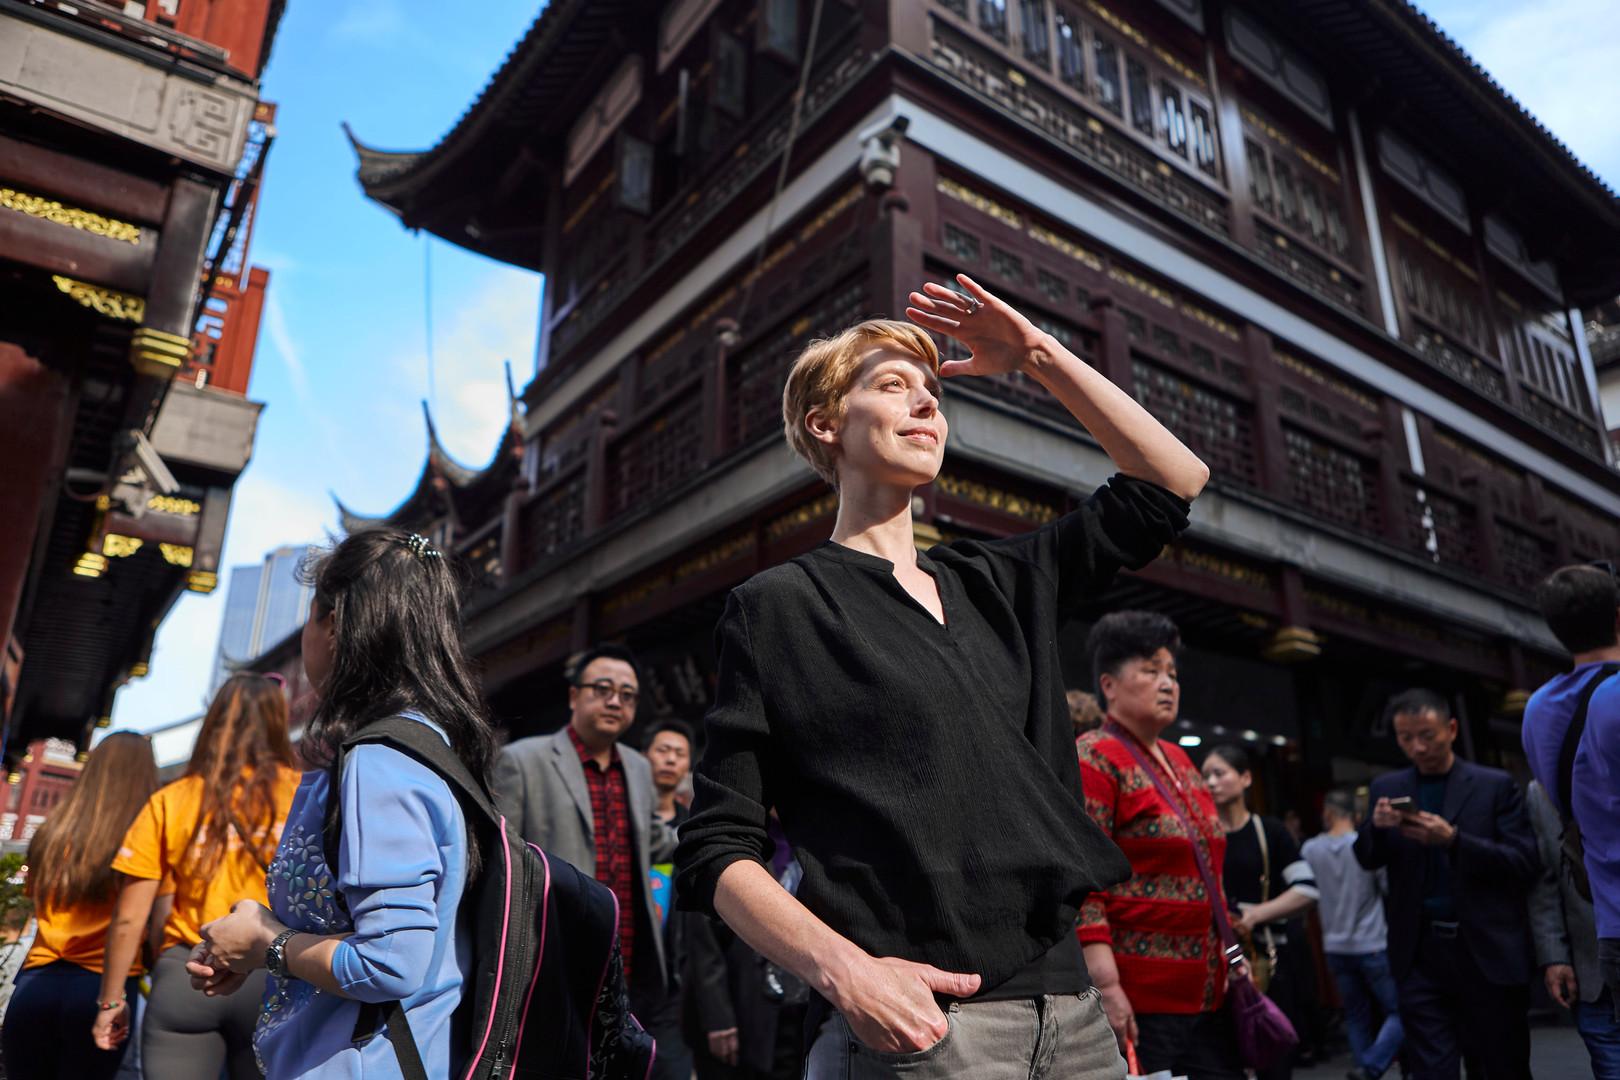 shanghai headshot on location